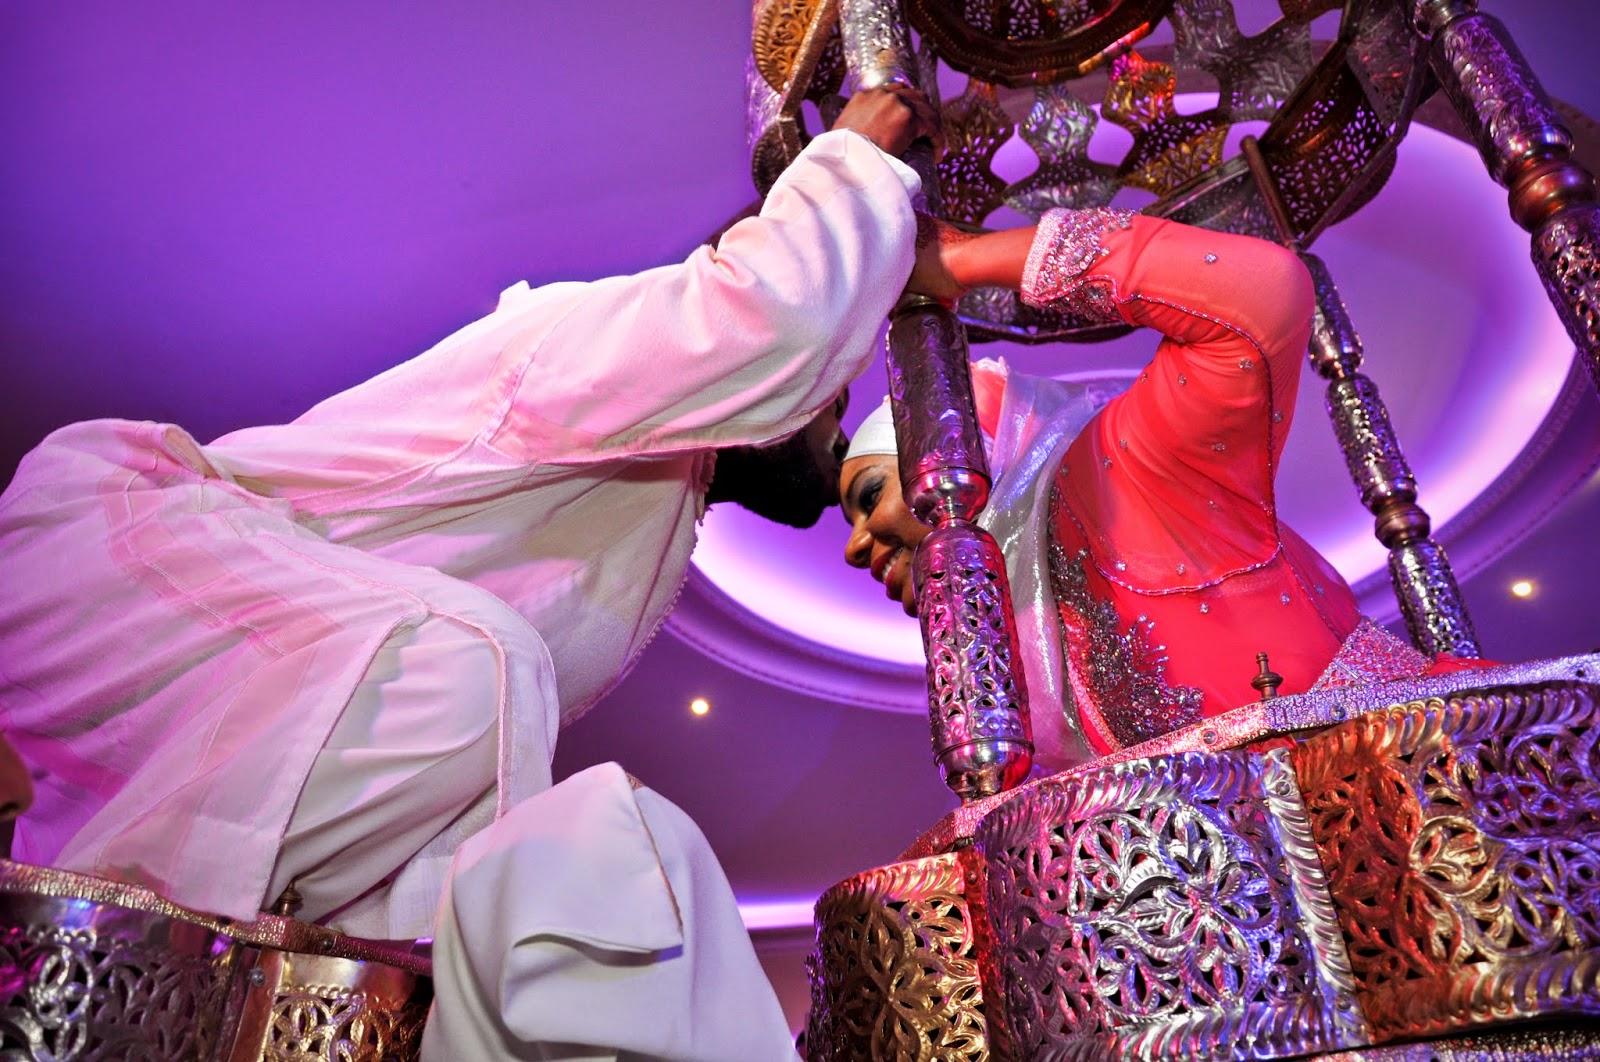 Dj Mariage mixte dj mariage malien tunsien recherche dj oriental mixte